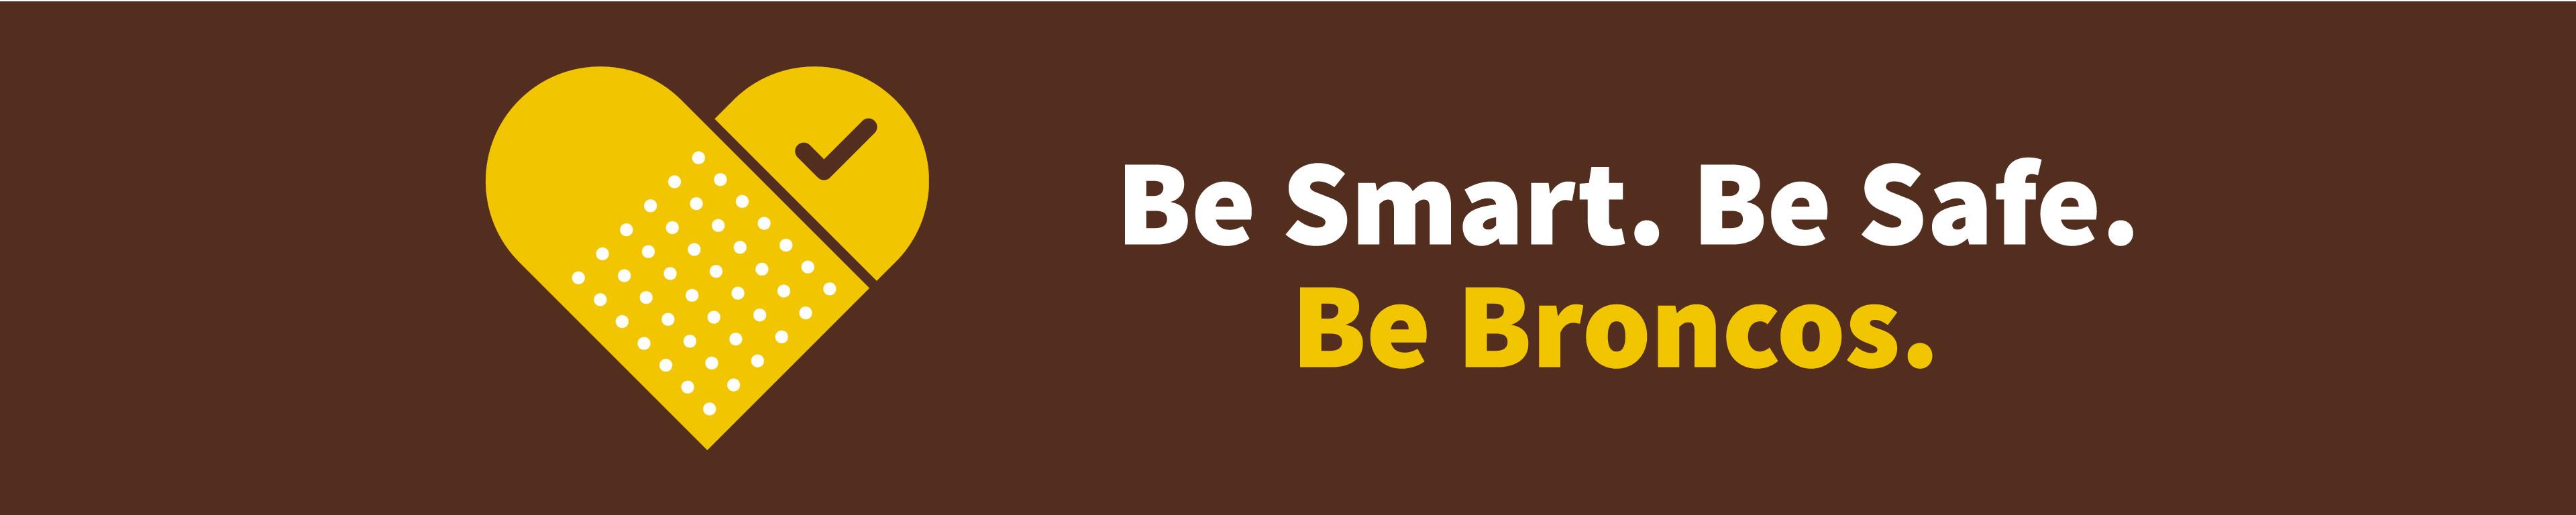 Be Smart. Be Safe. Be Broncos.